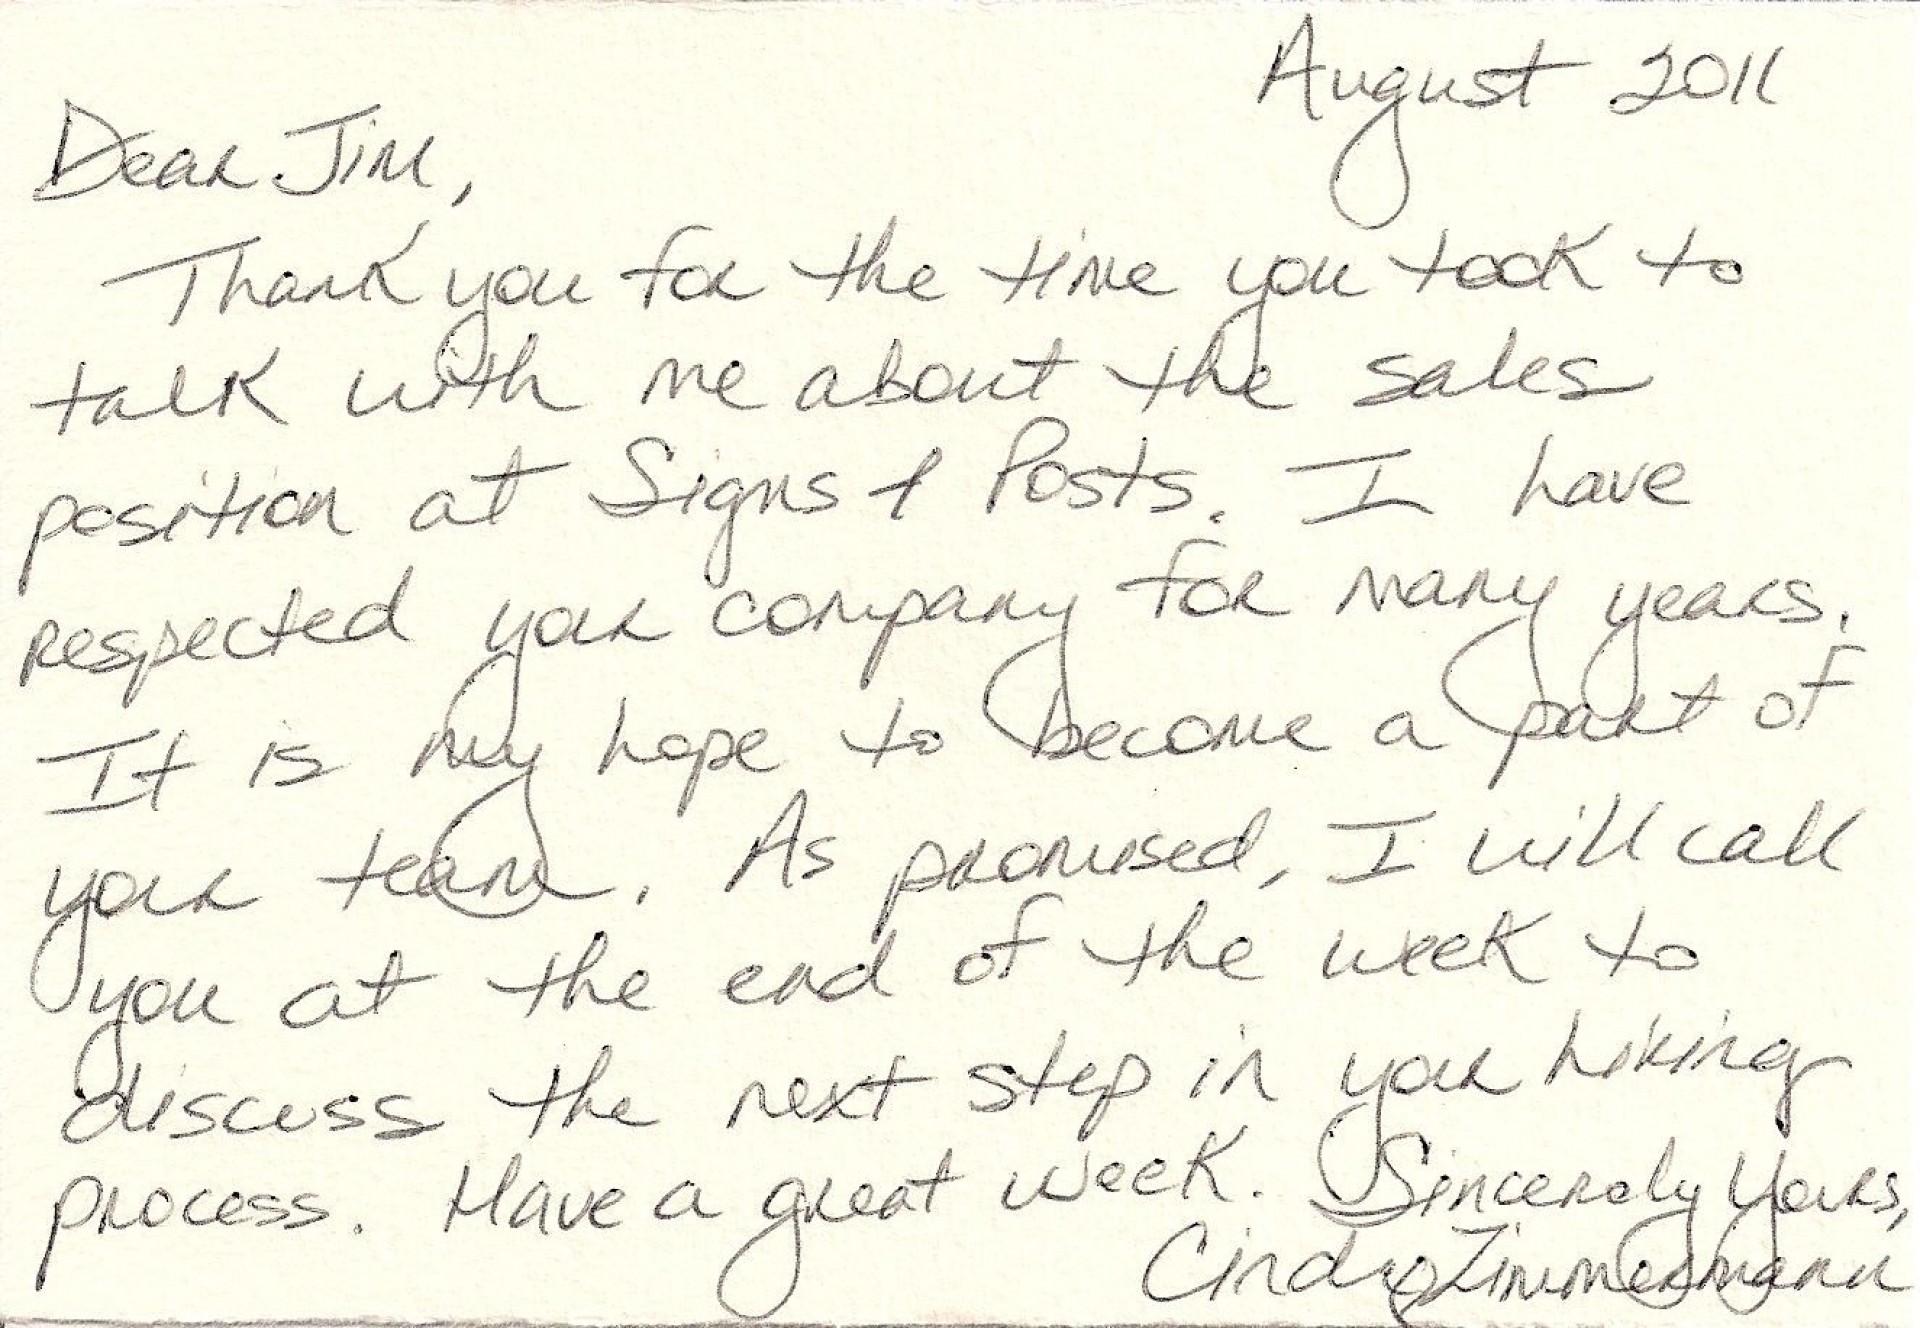 003 Astounding Handwritten Thank You Note After Interview Template Sample 1920